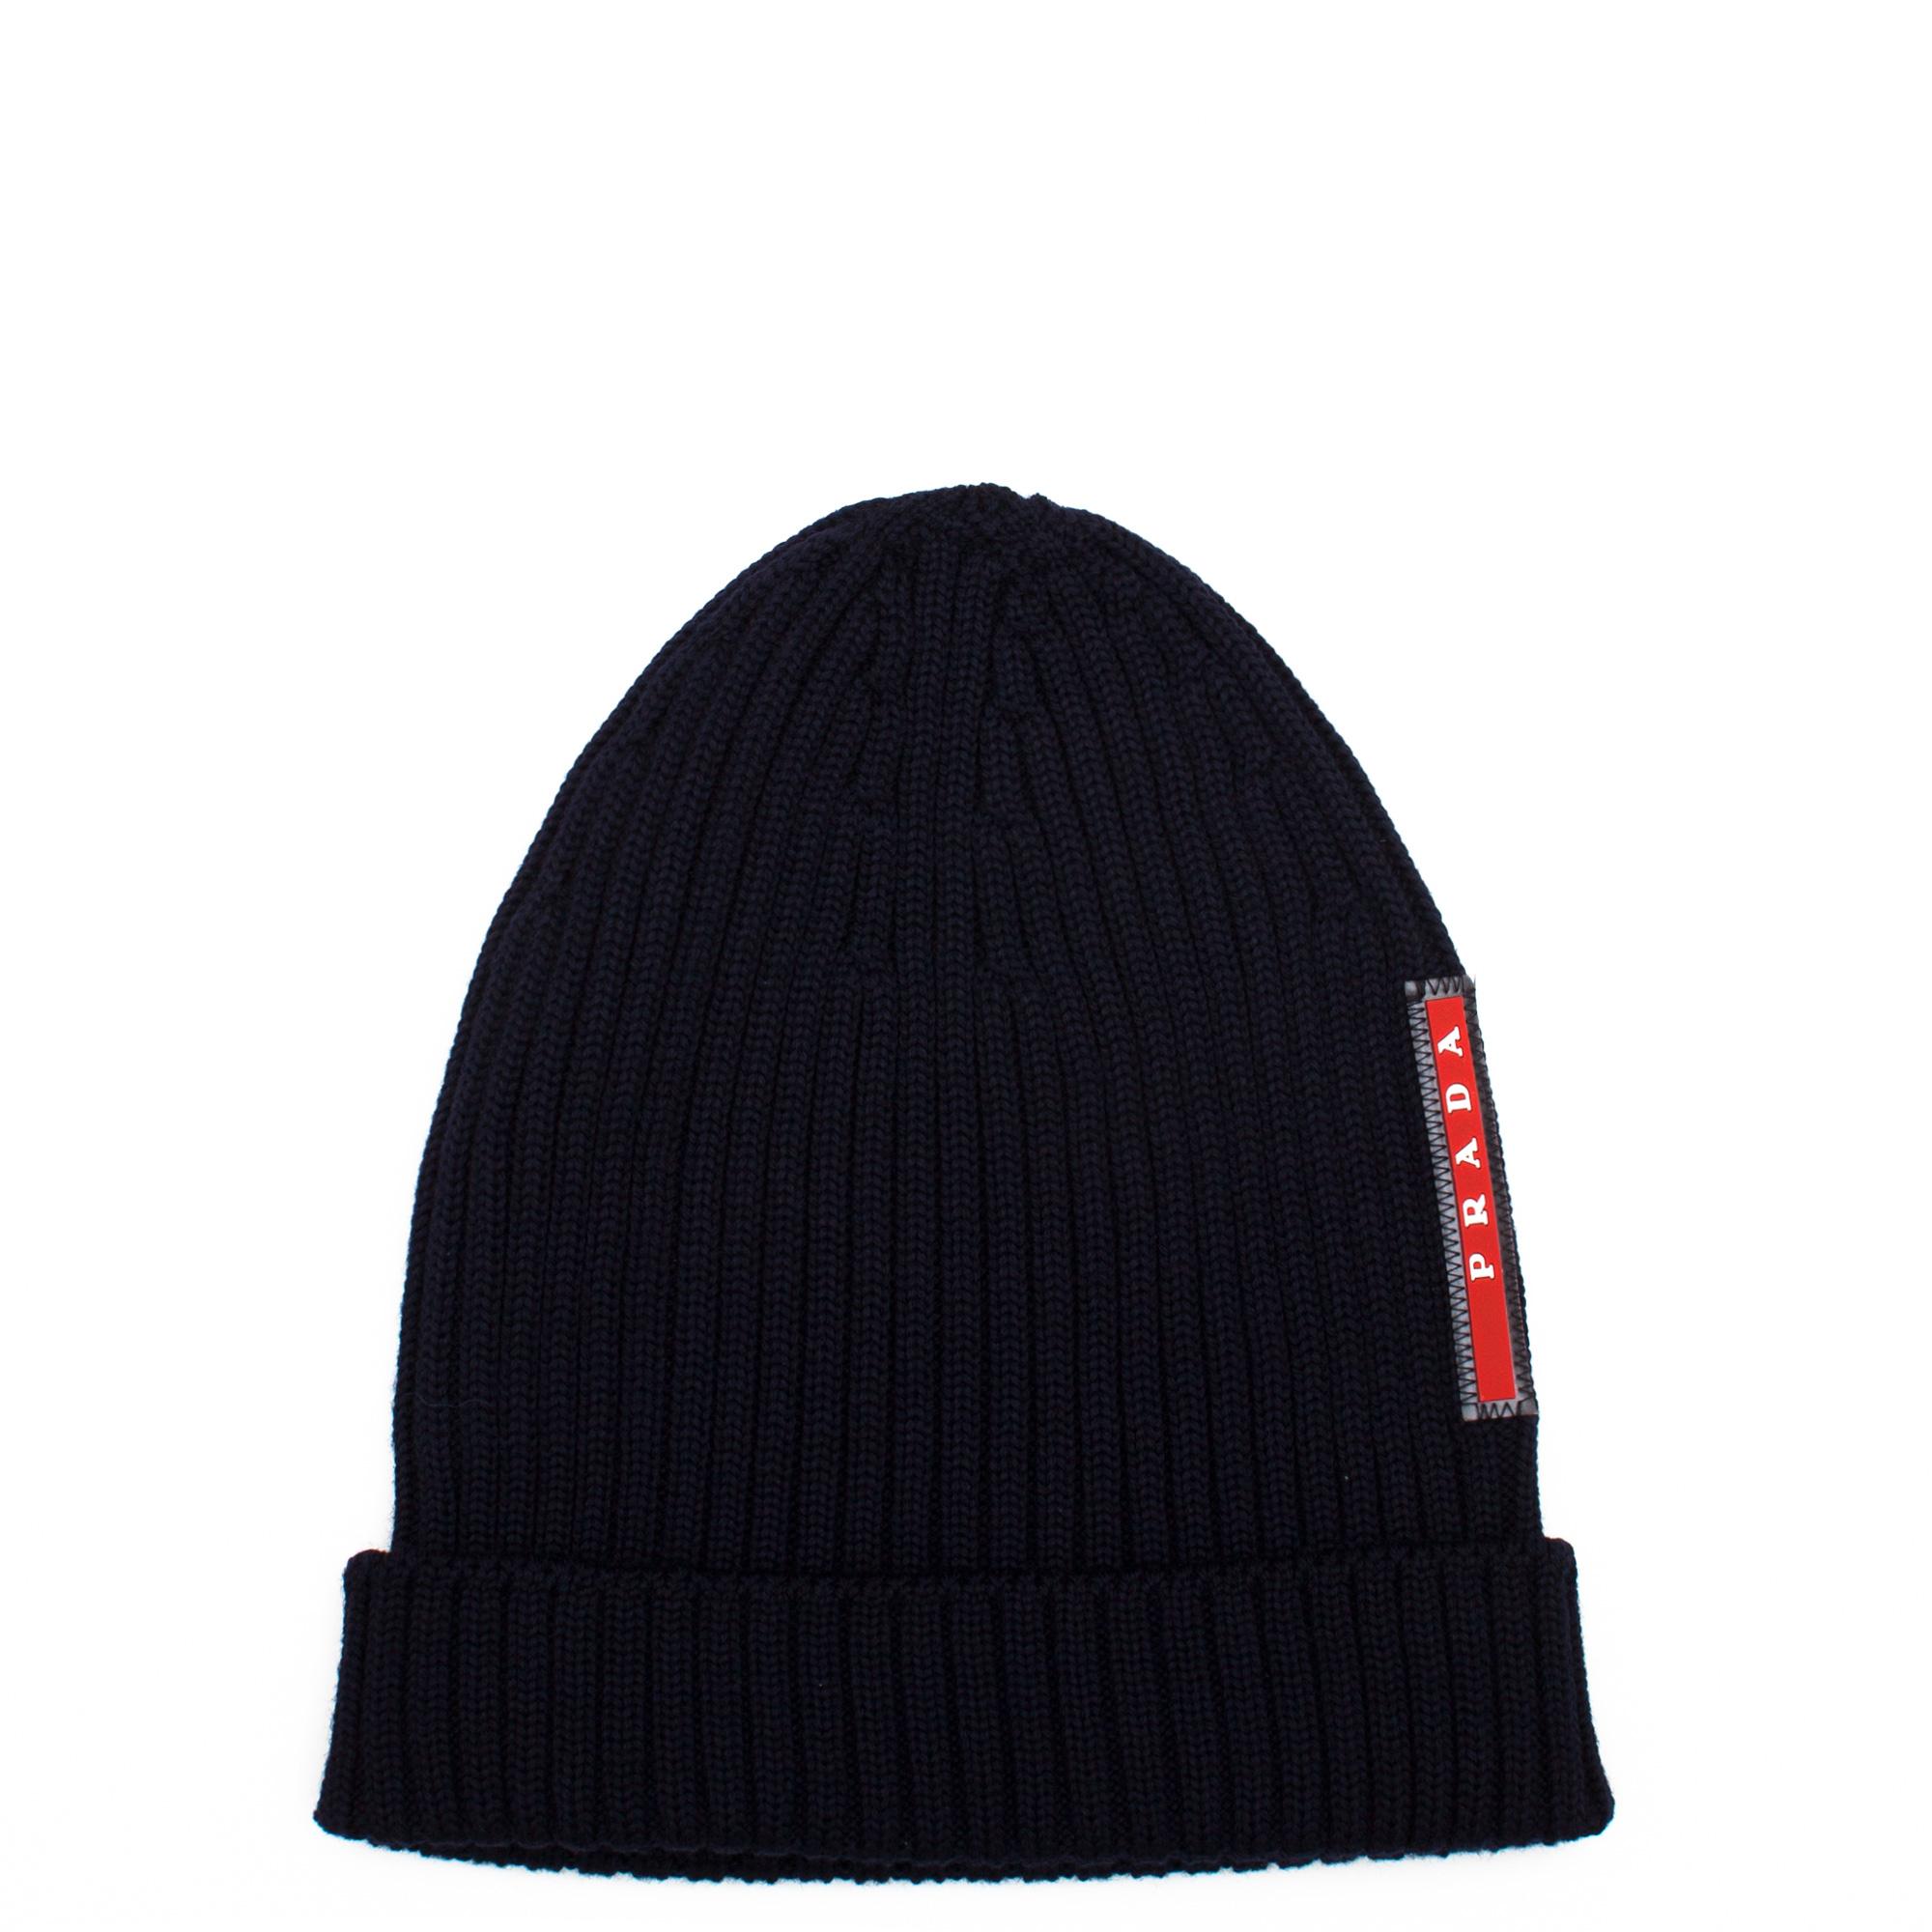 rabbit knitted hat - Black Prada 9K49yWqPvz